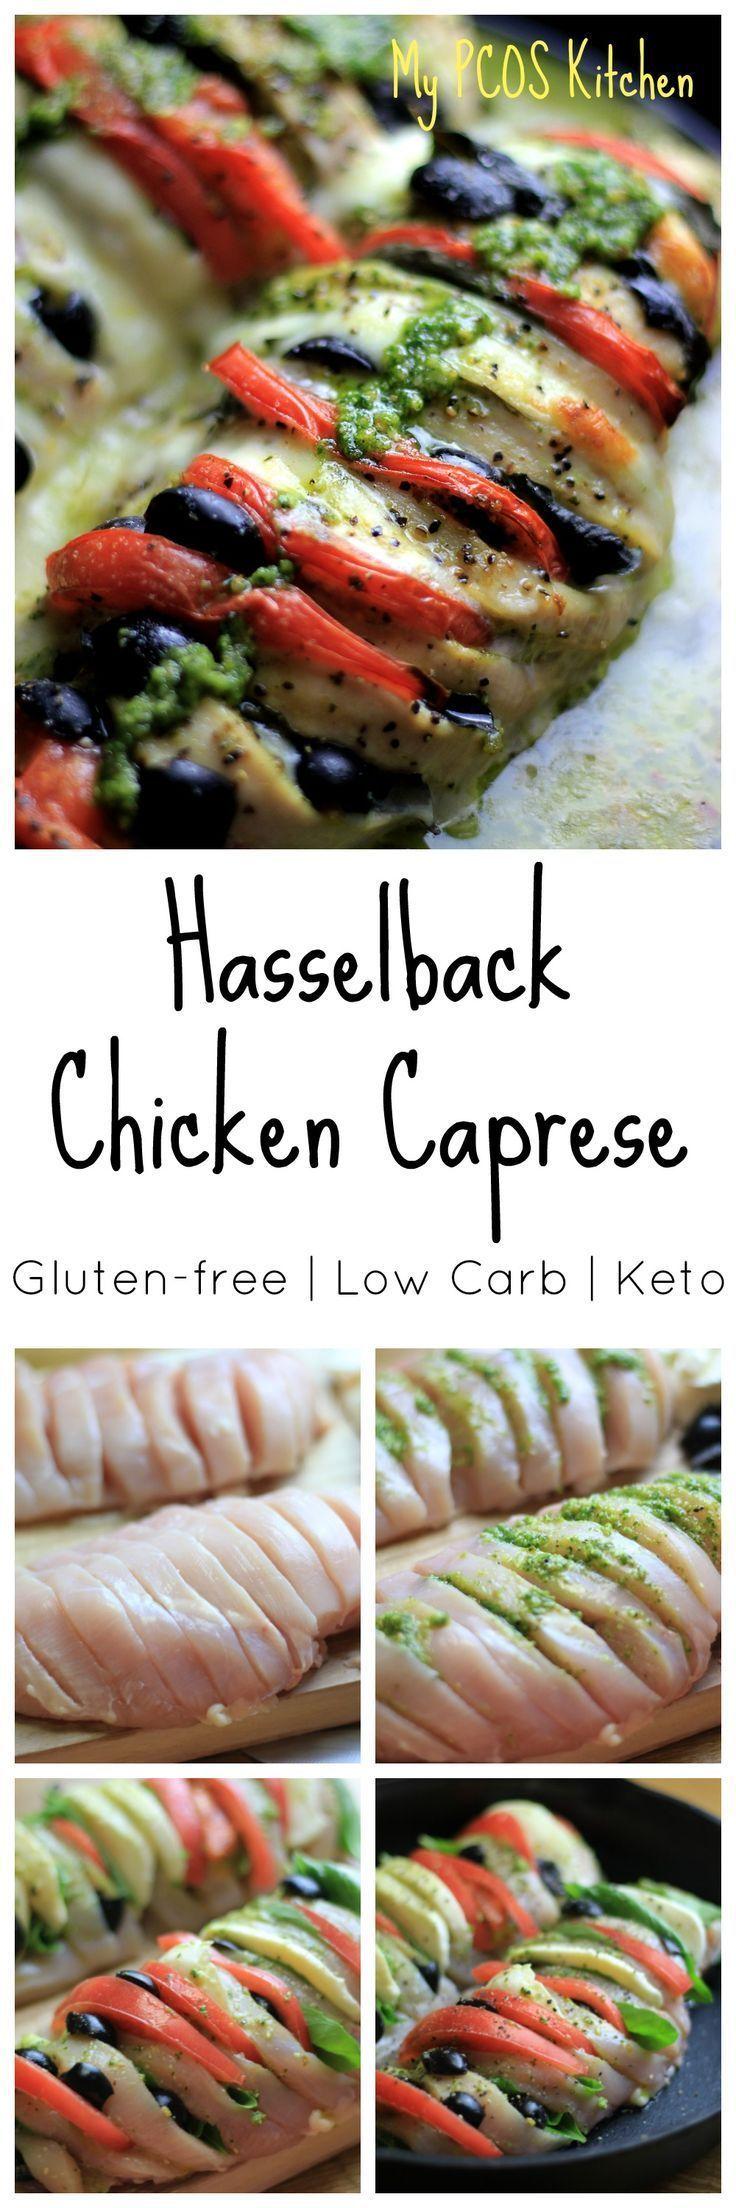 - Hasselback Chicken Caprese - chicken breast sliced and stuffed with mozzarella, pesto, tomato, basil and olives -